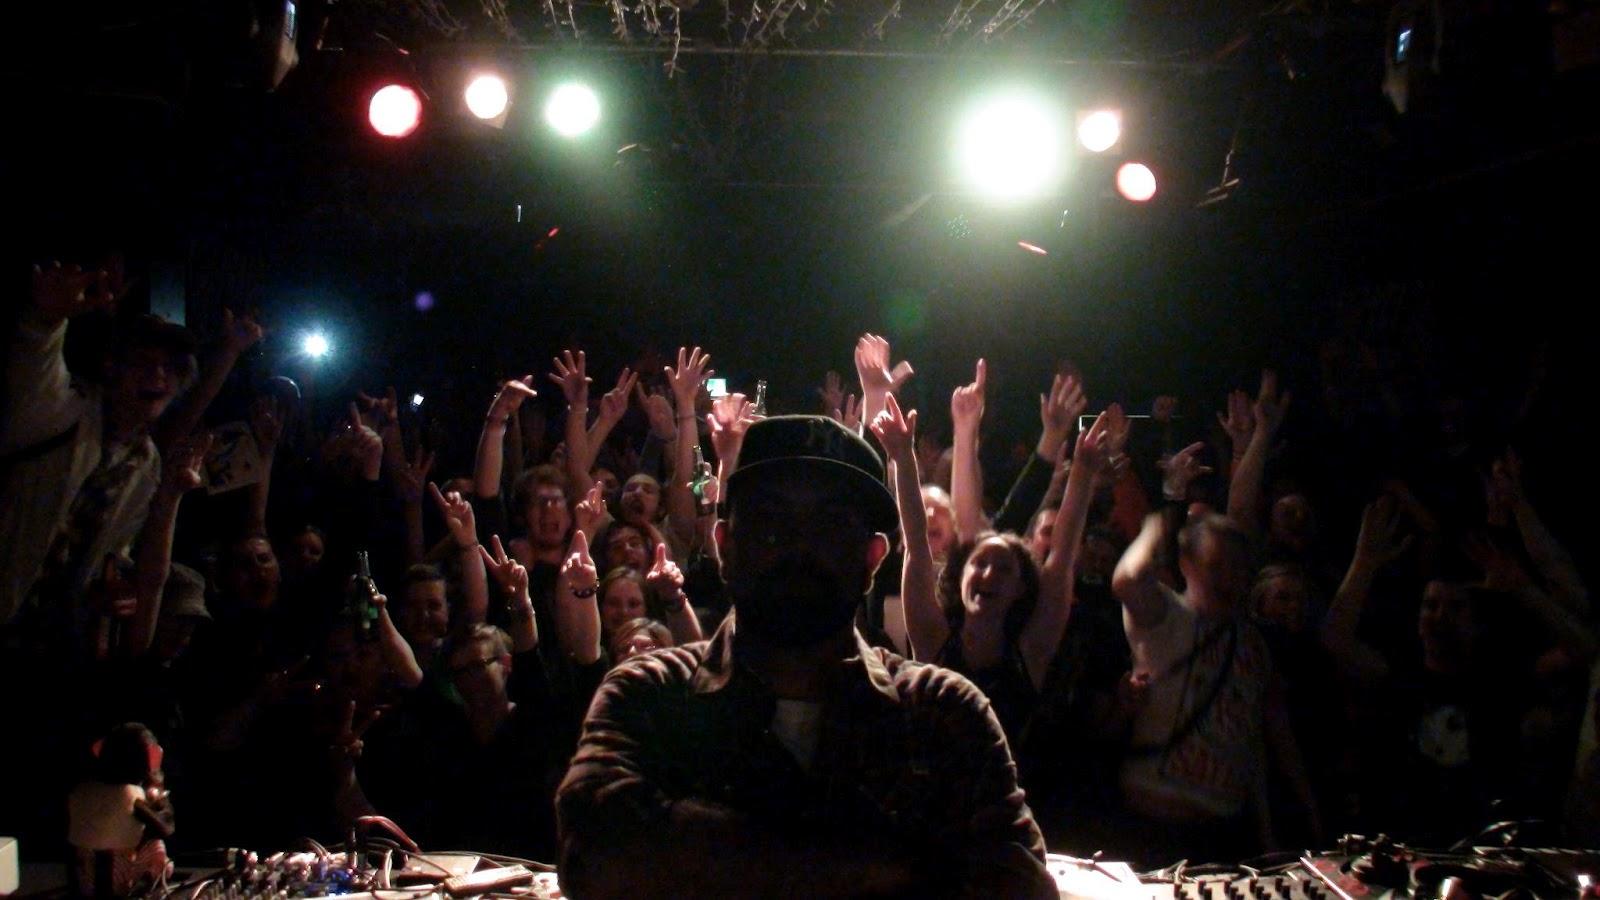 Dublin techno the best clubs in dublin for techno house for Best club house songs